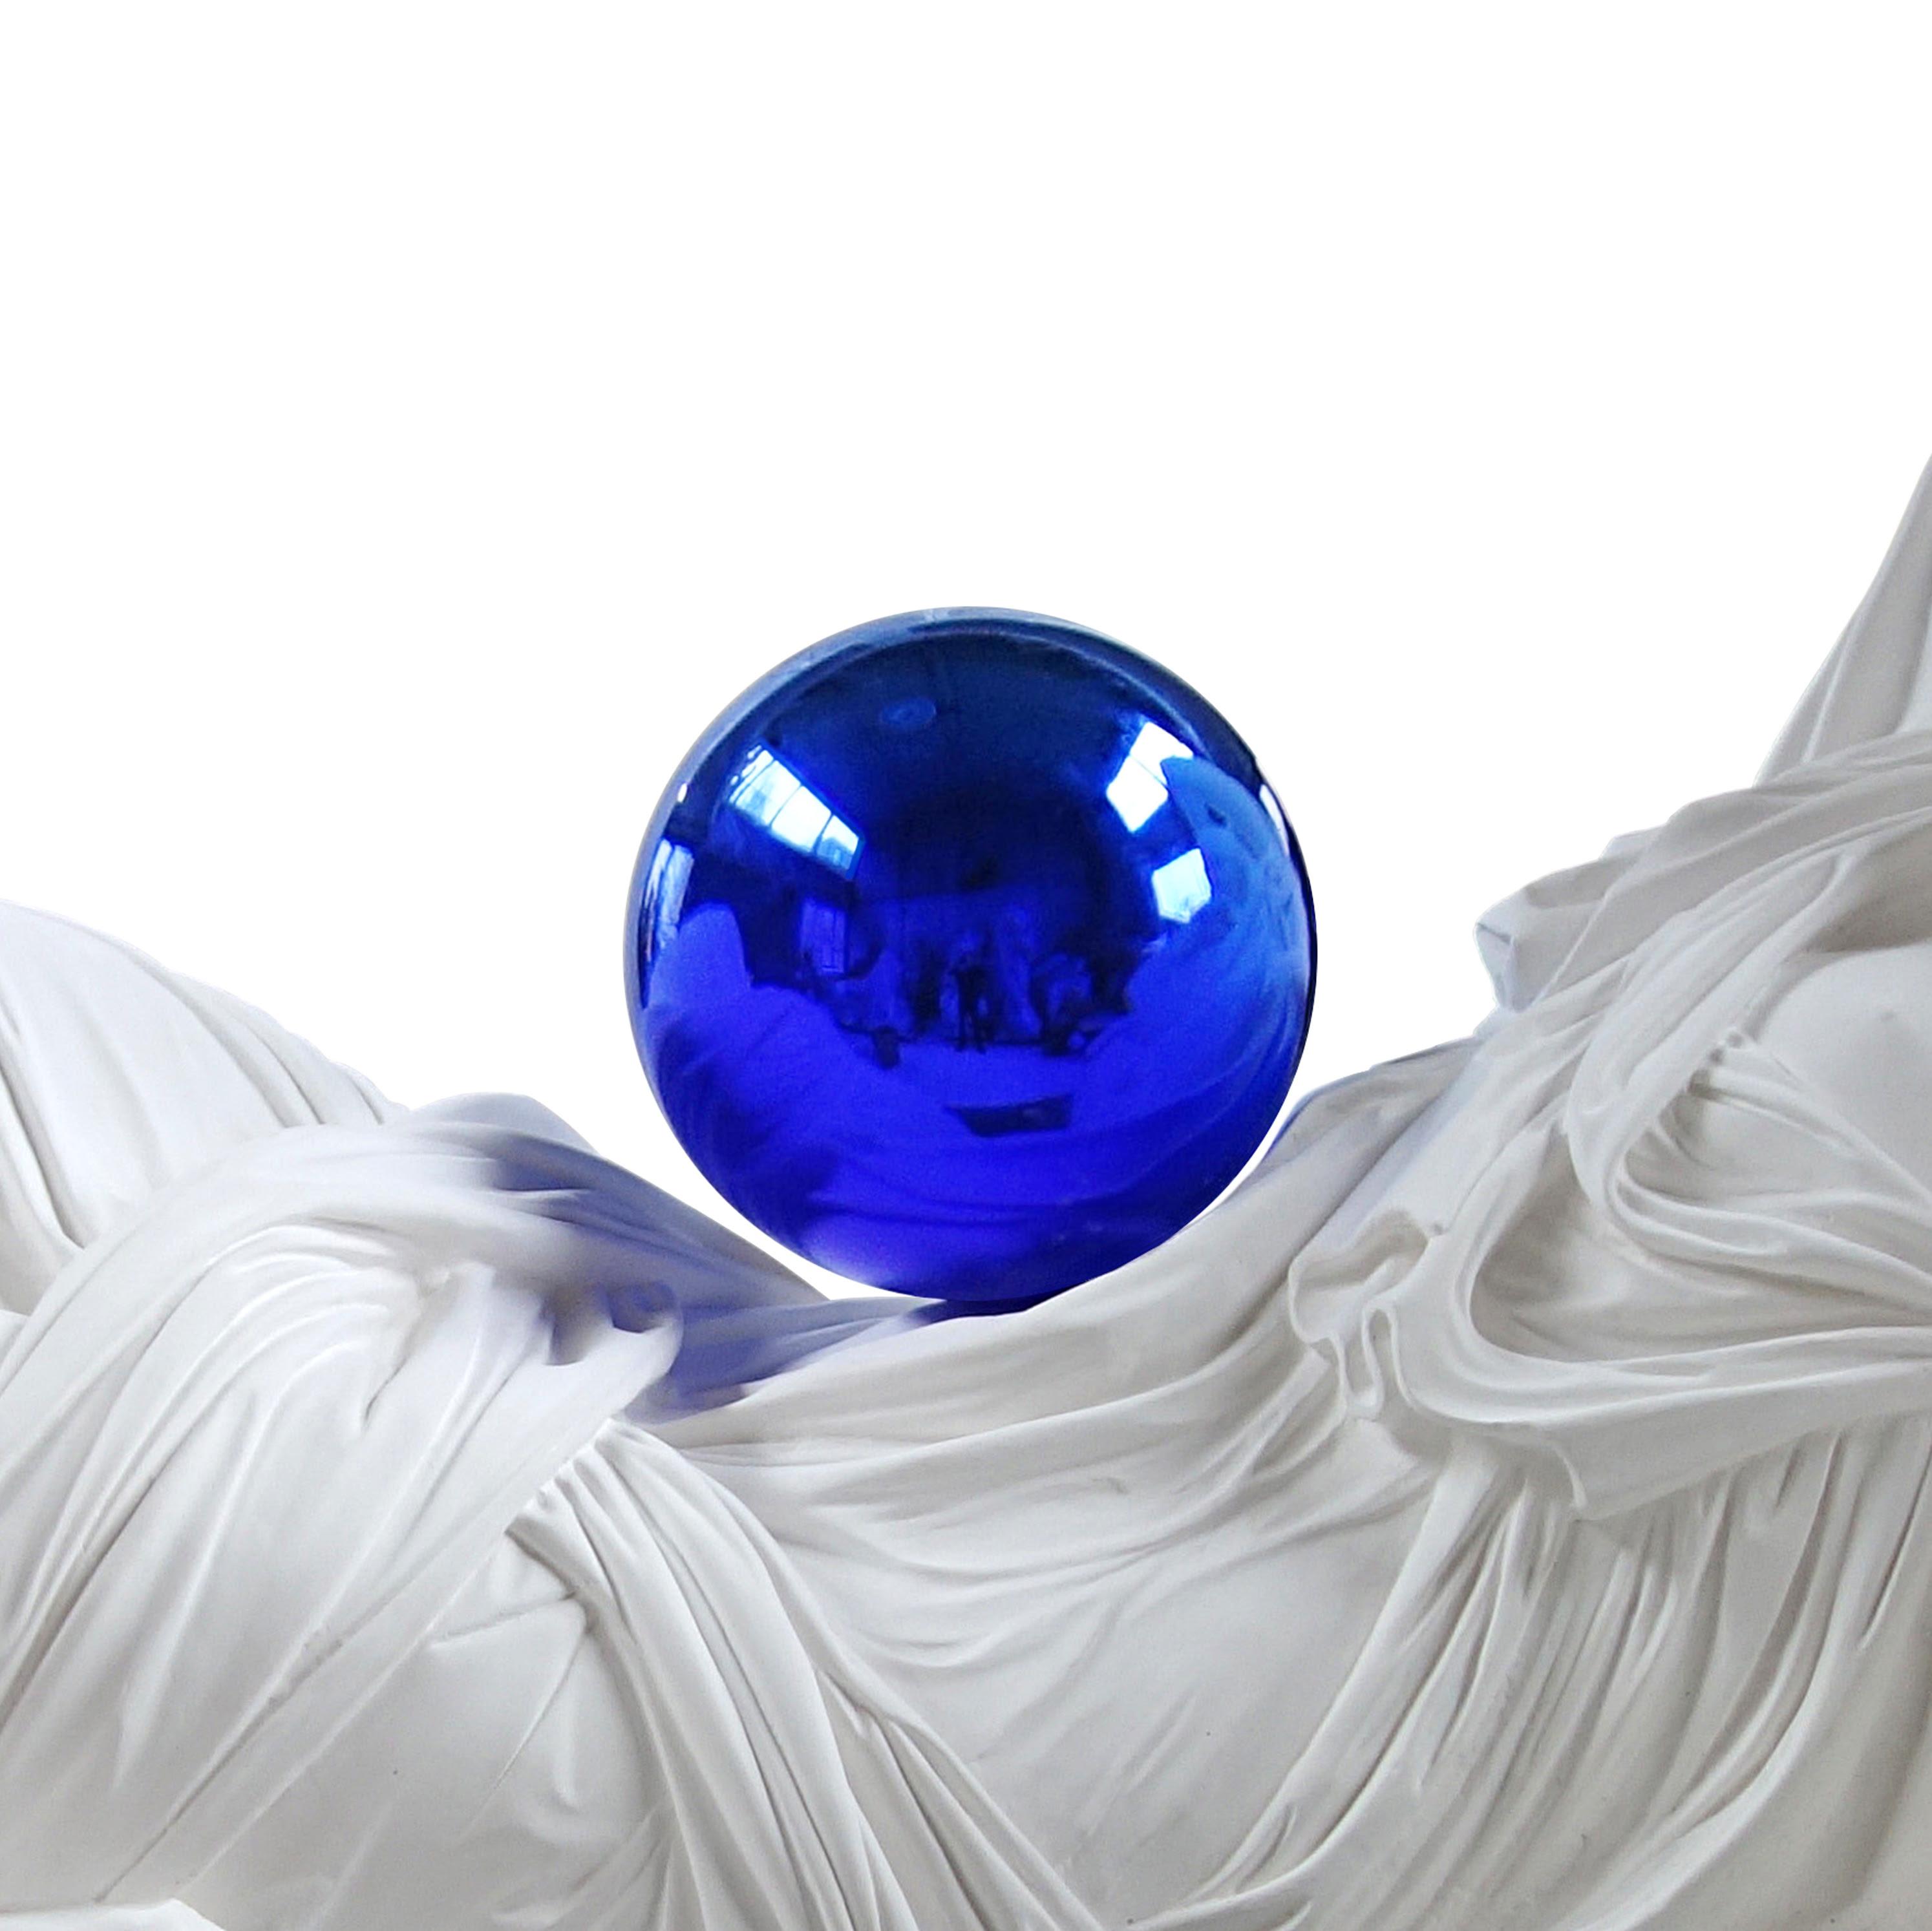 Gazing Ball (Ariadne), 2013 © Jeff Koons, David Zwirner